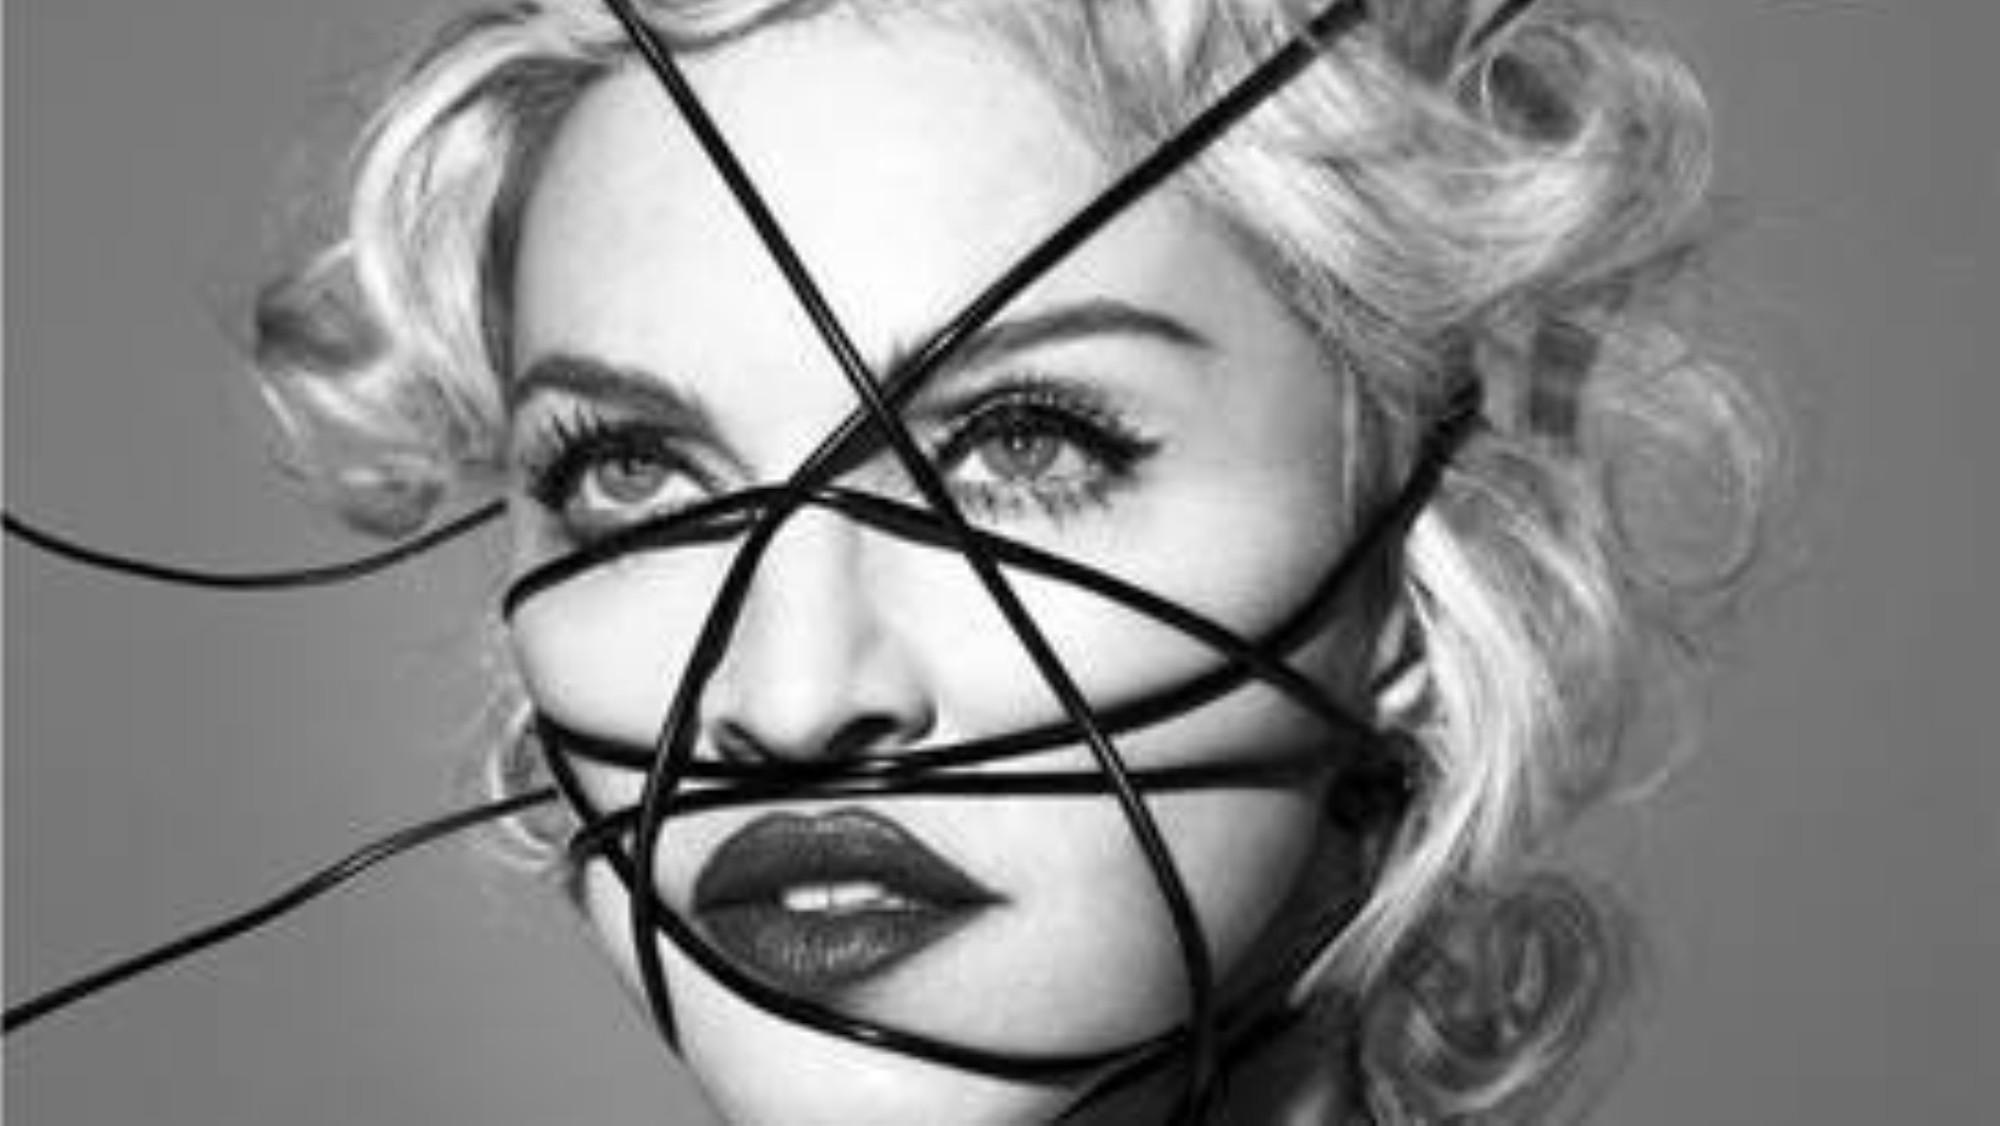 Madonna'nın Albümünü Sızdıran Hacker Yakalandı!